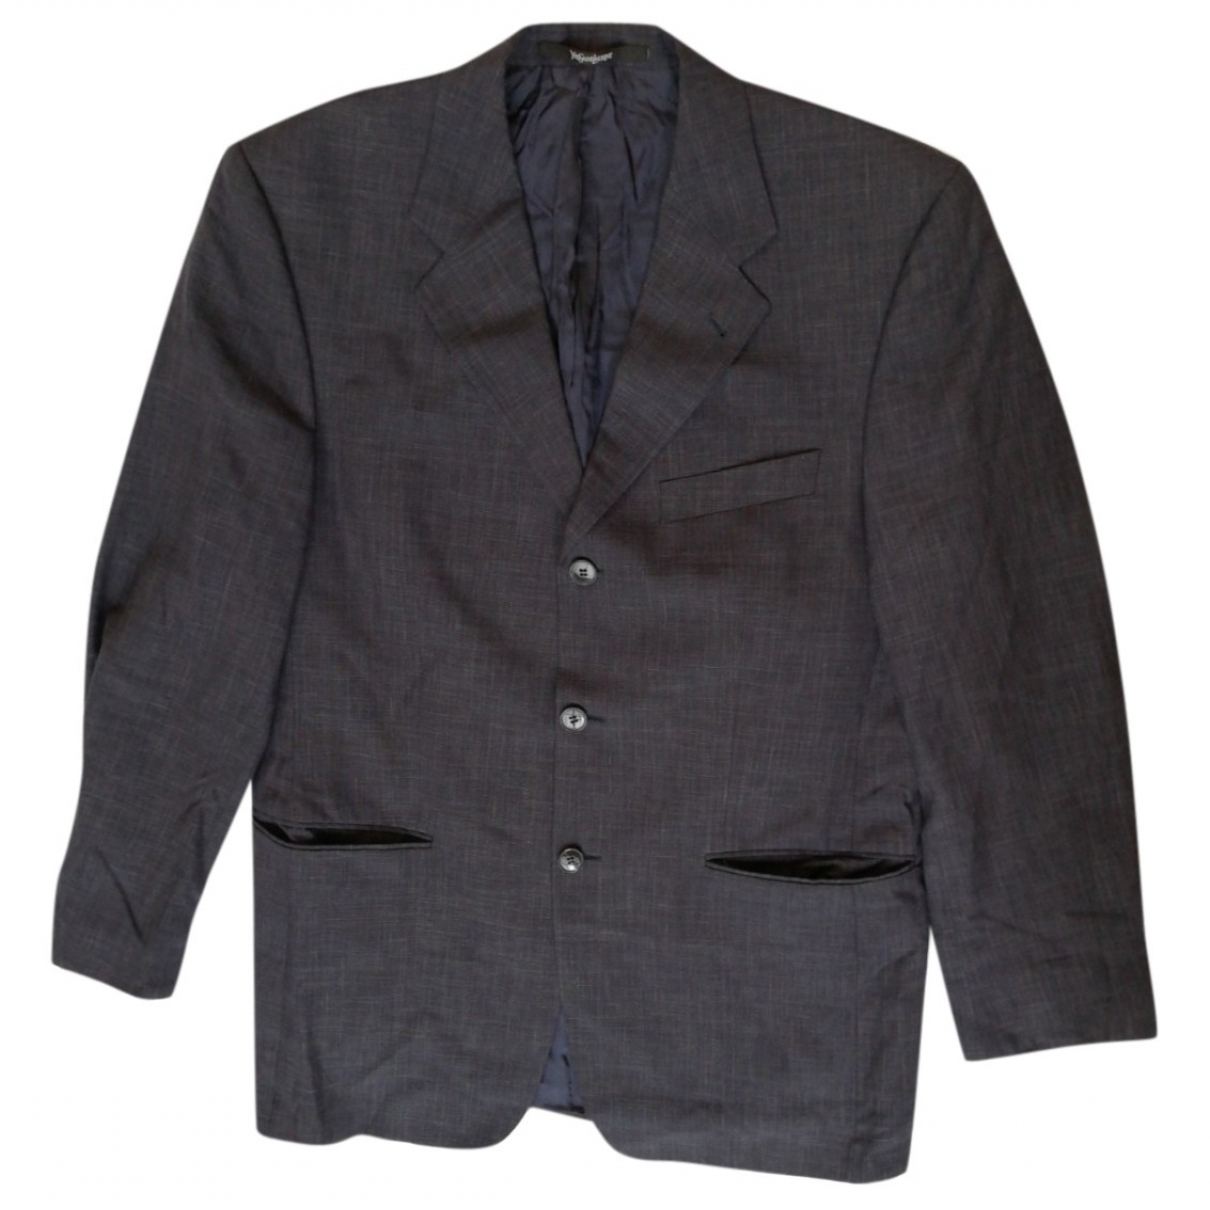 Saint Laurent \N Navy jacket  for Men 50 IT